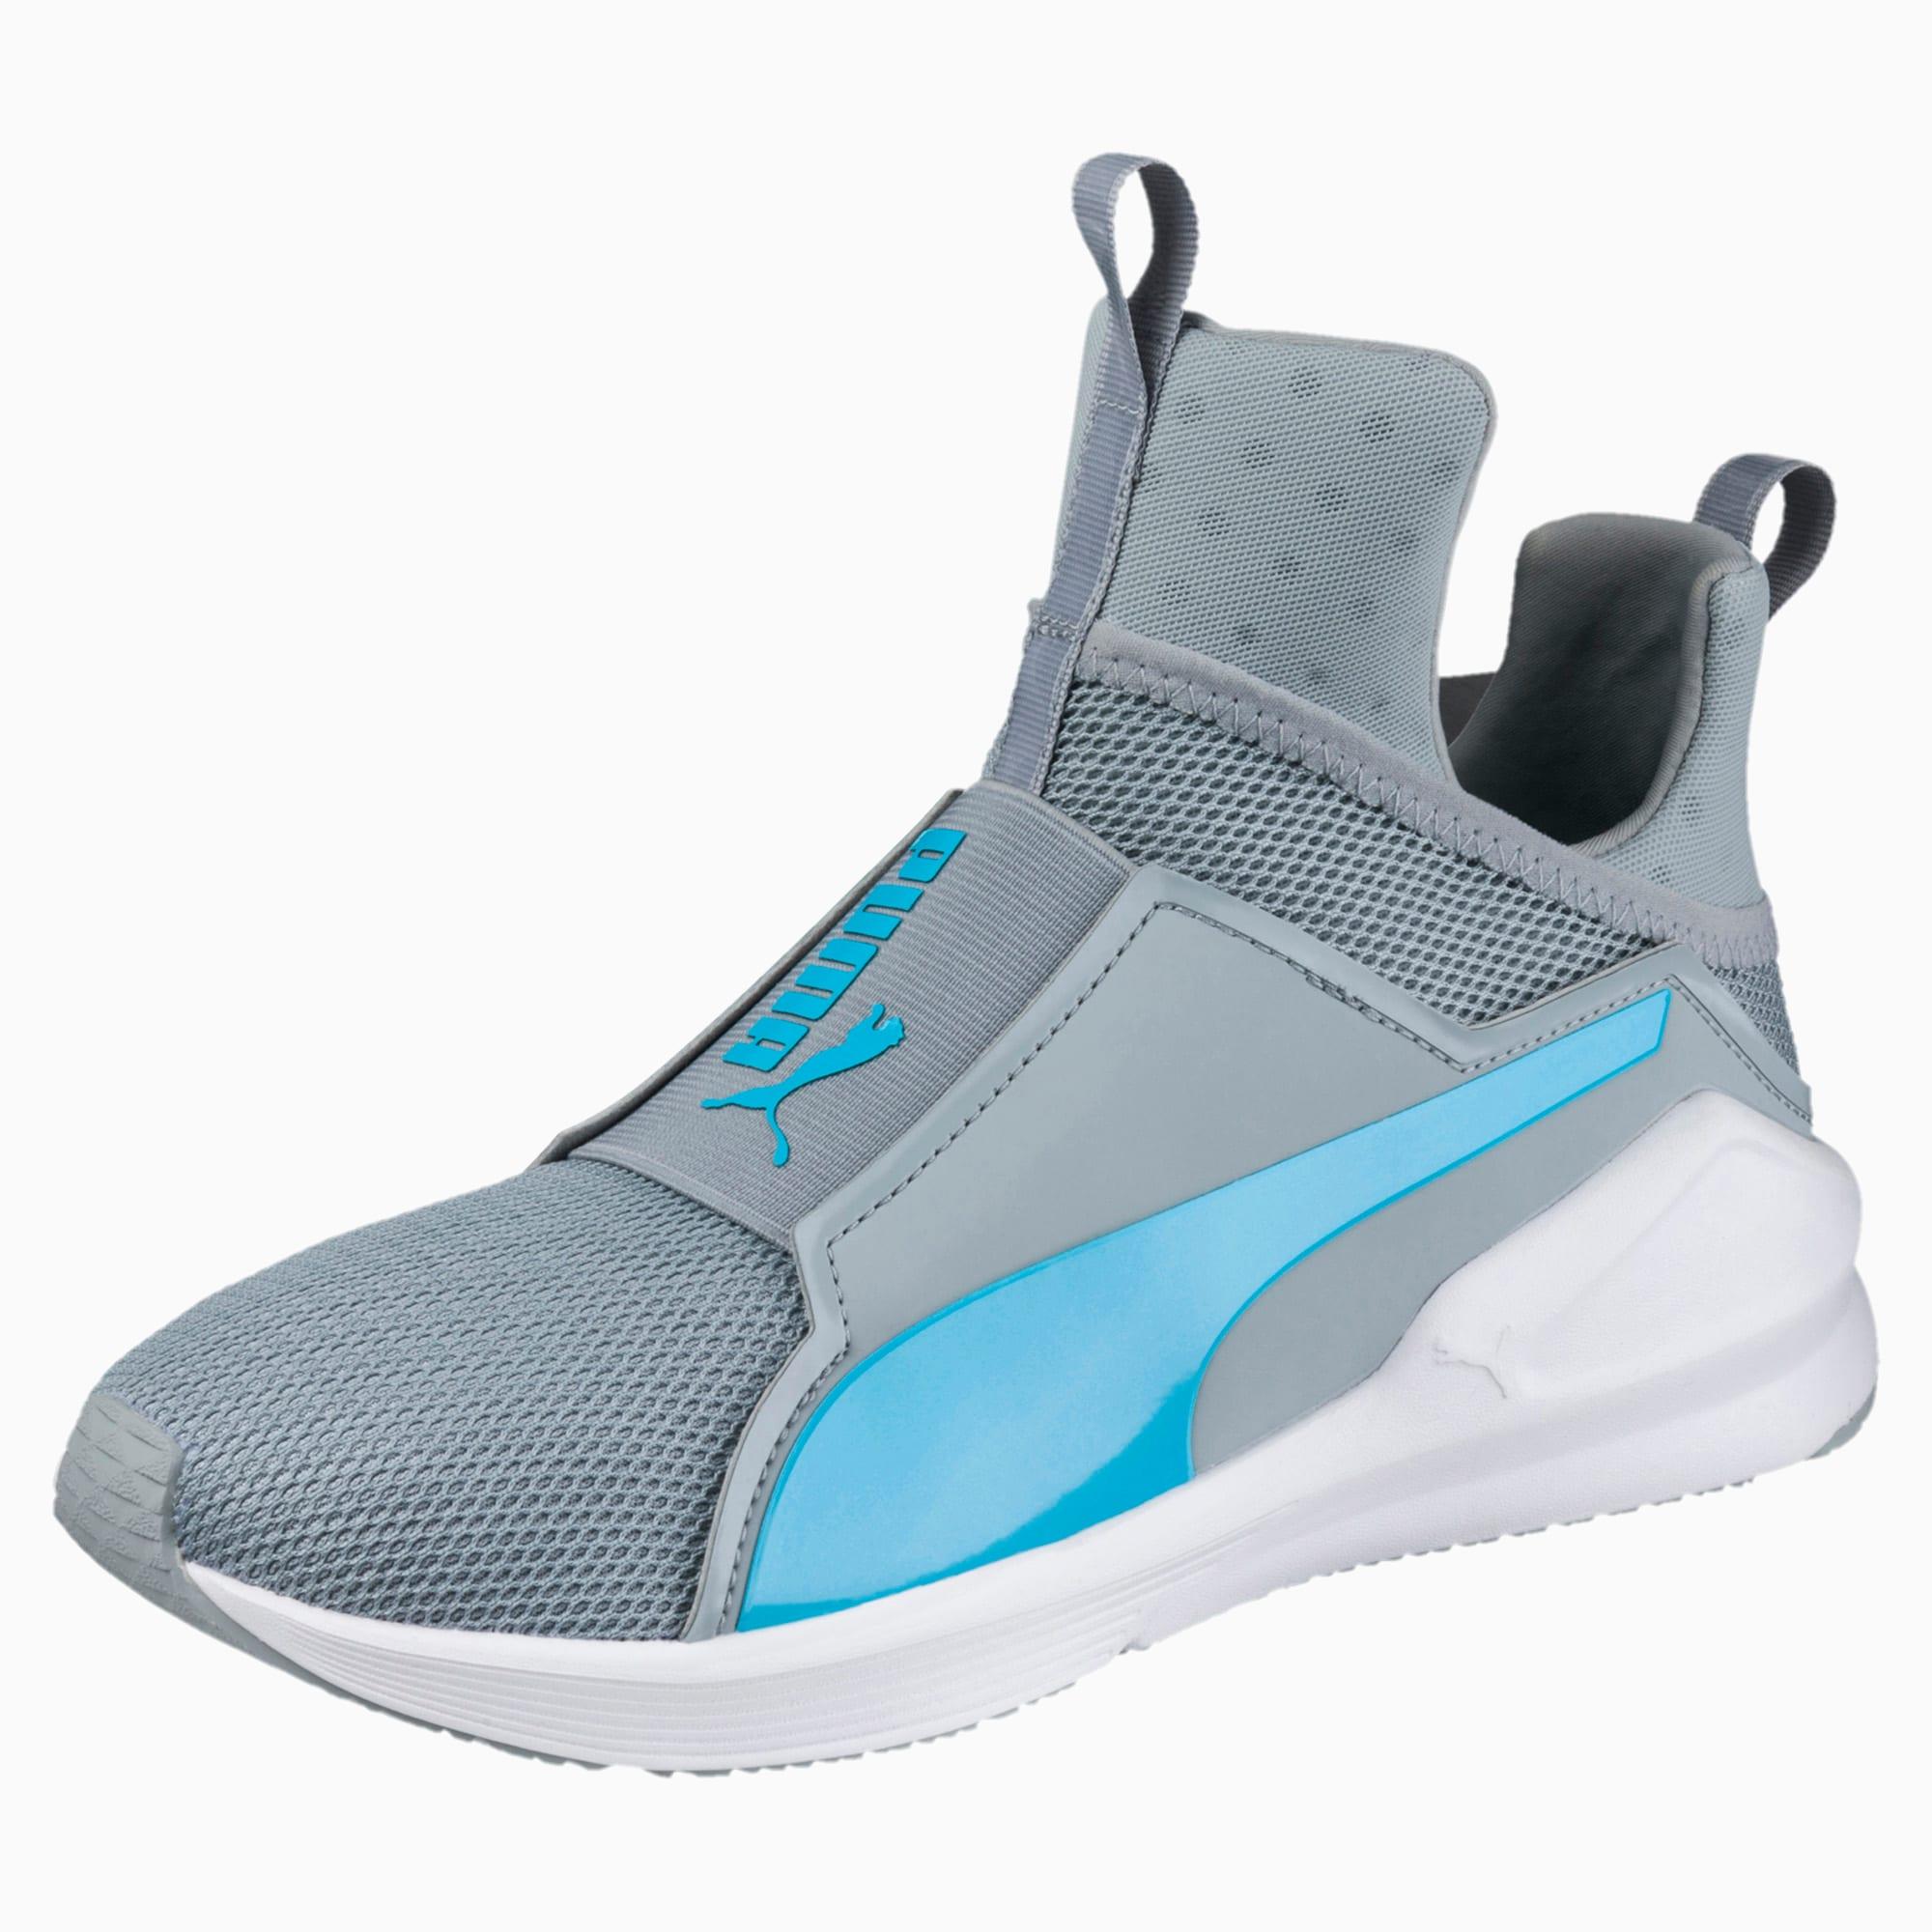 PUMA Fierce Core Training Shoes